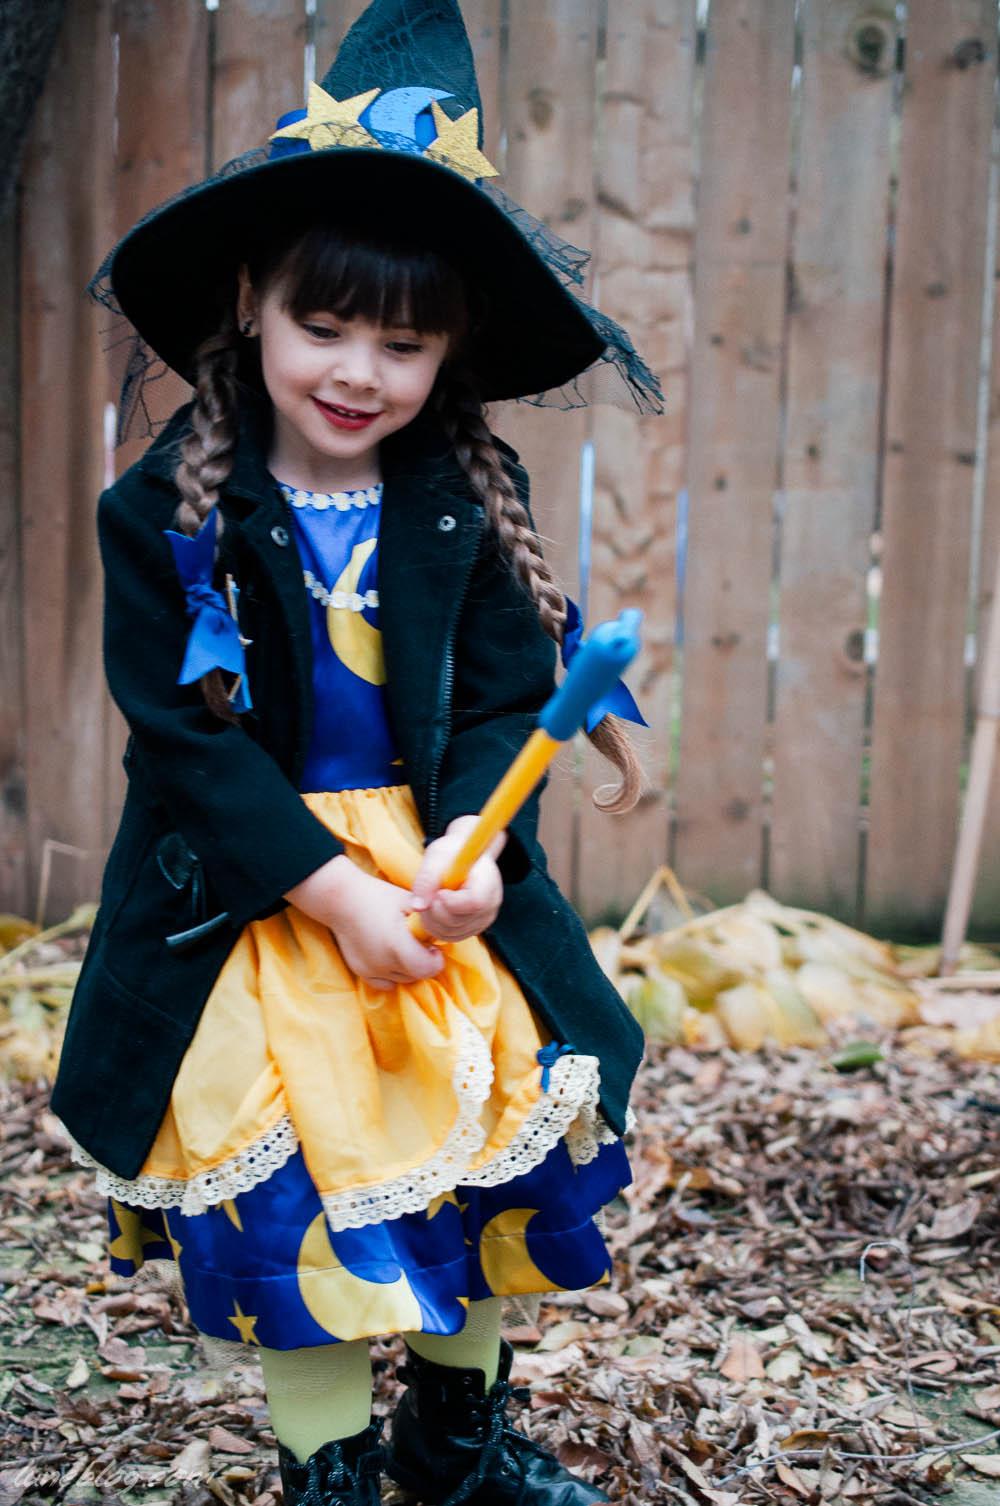 halloween costumes 2015 lune travels blog (36 of 39).jpg